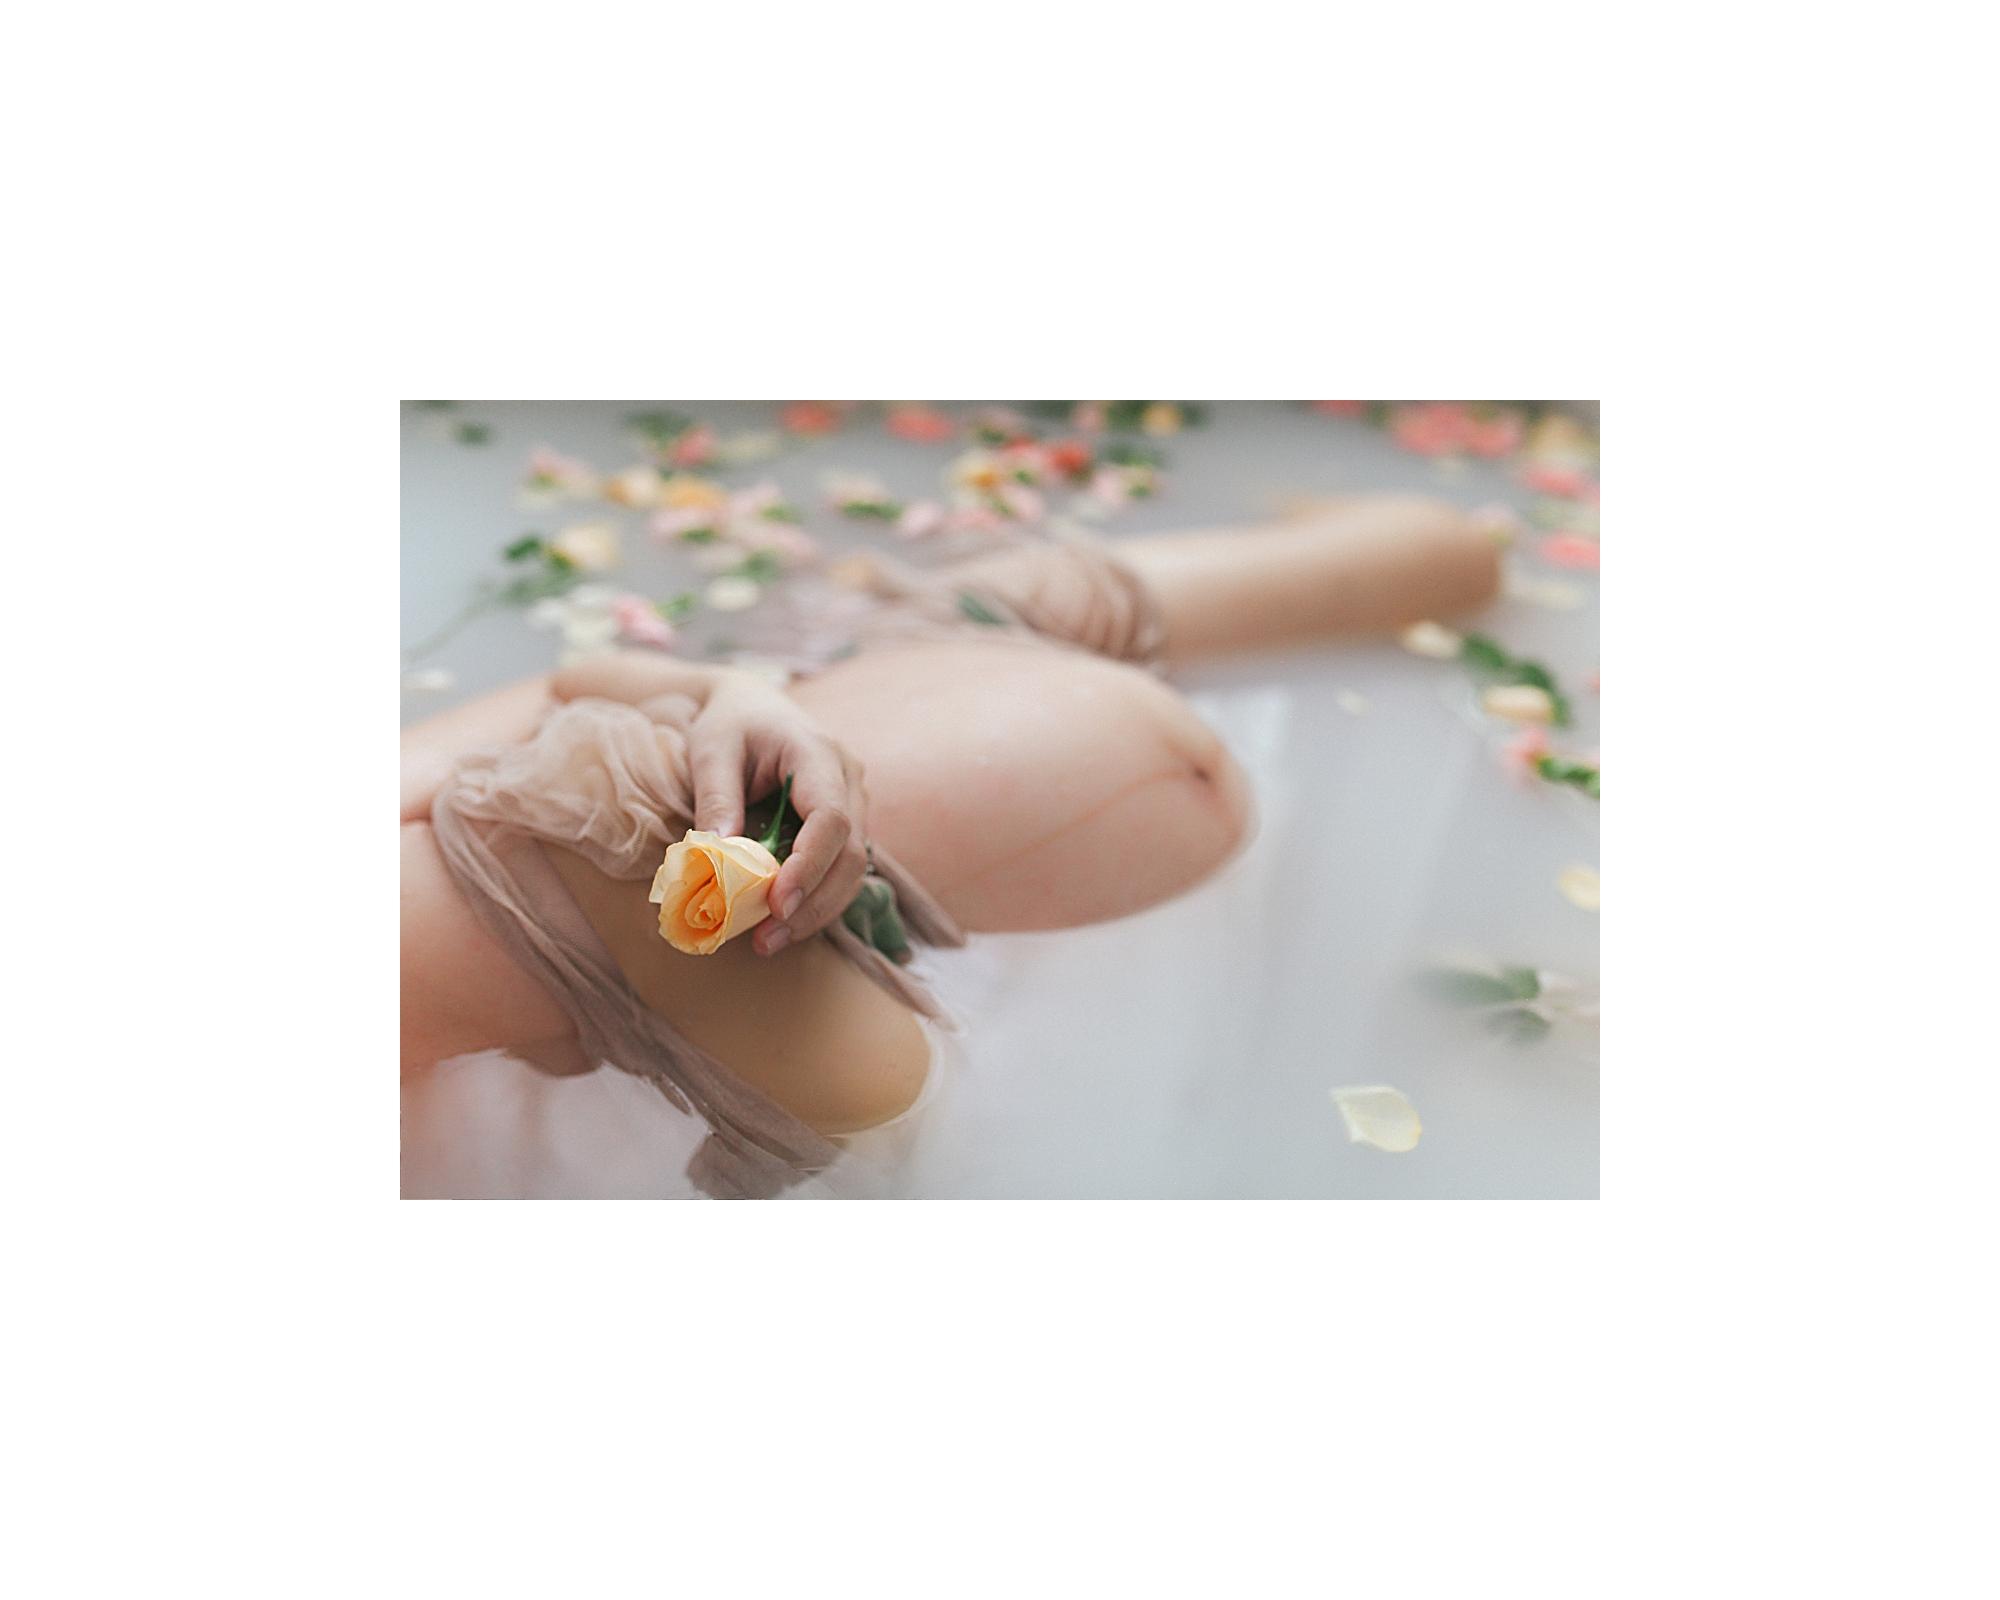 Flower Bath Maternity Shoot Cebu Photographer Cebu Philippines_0034